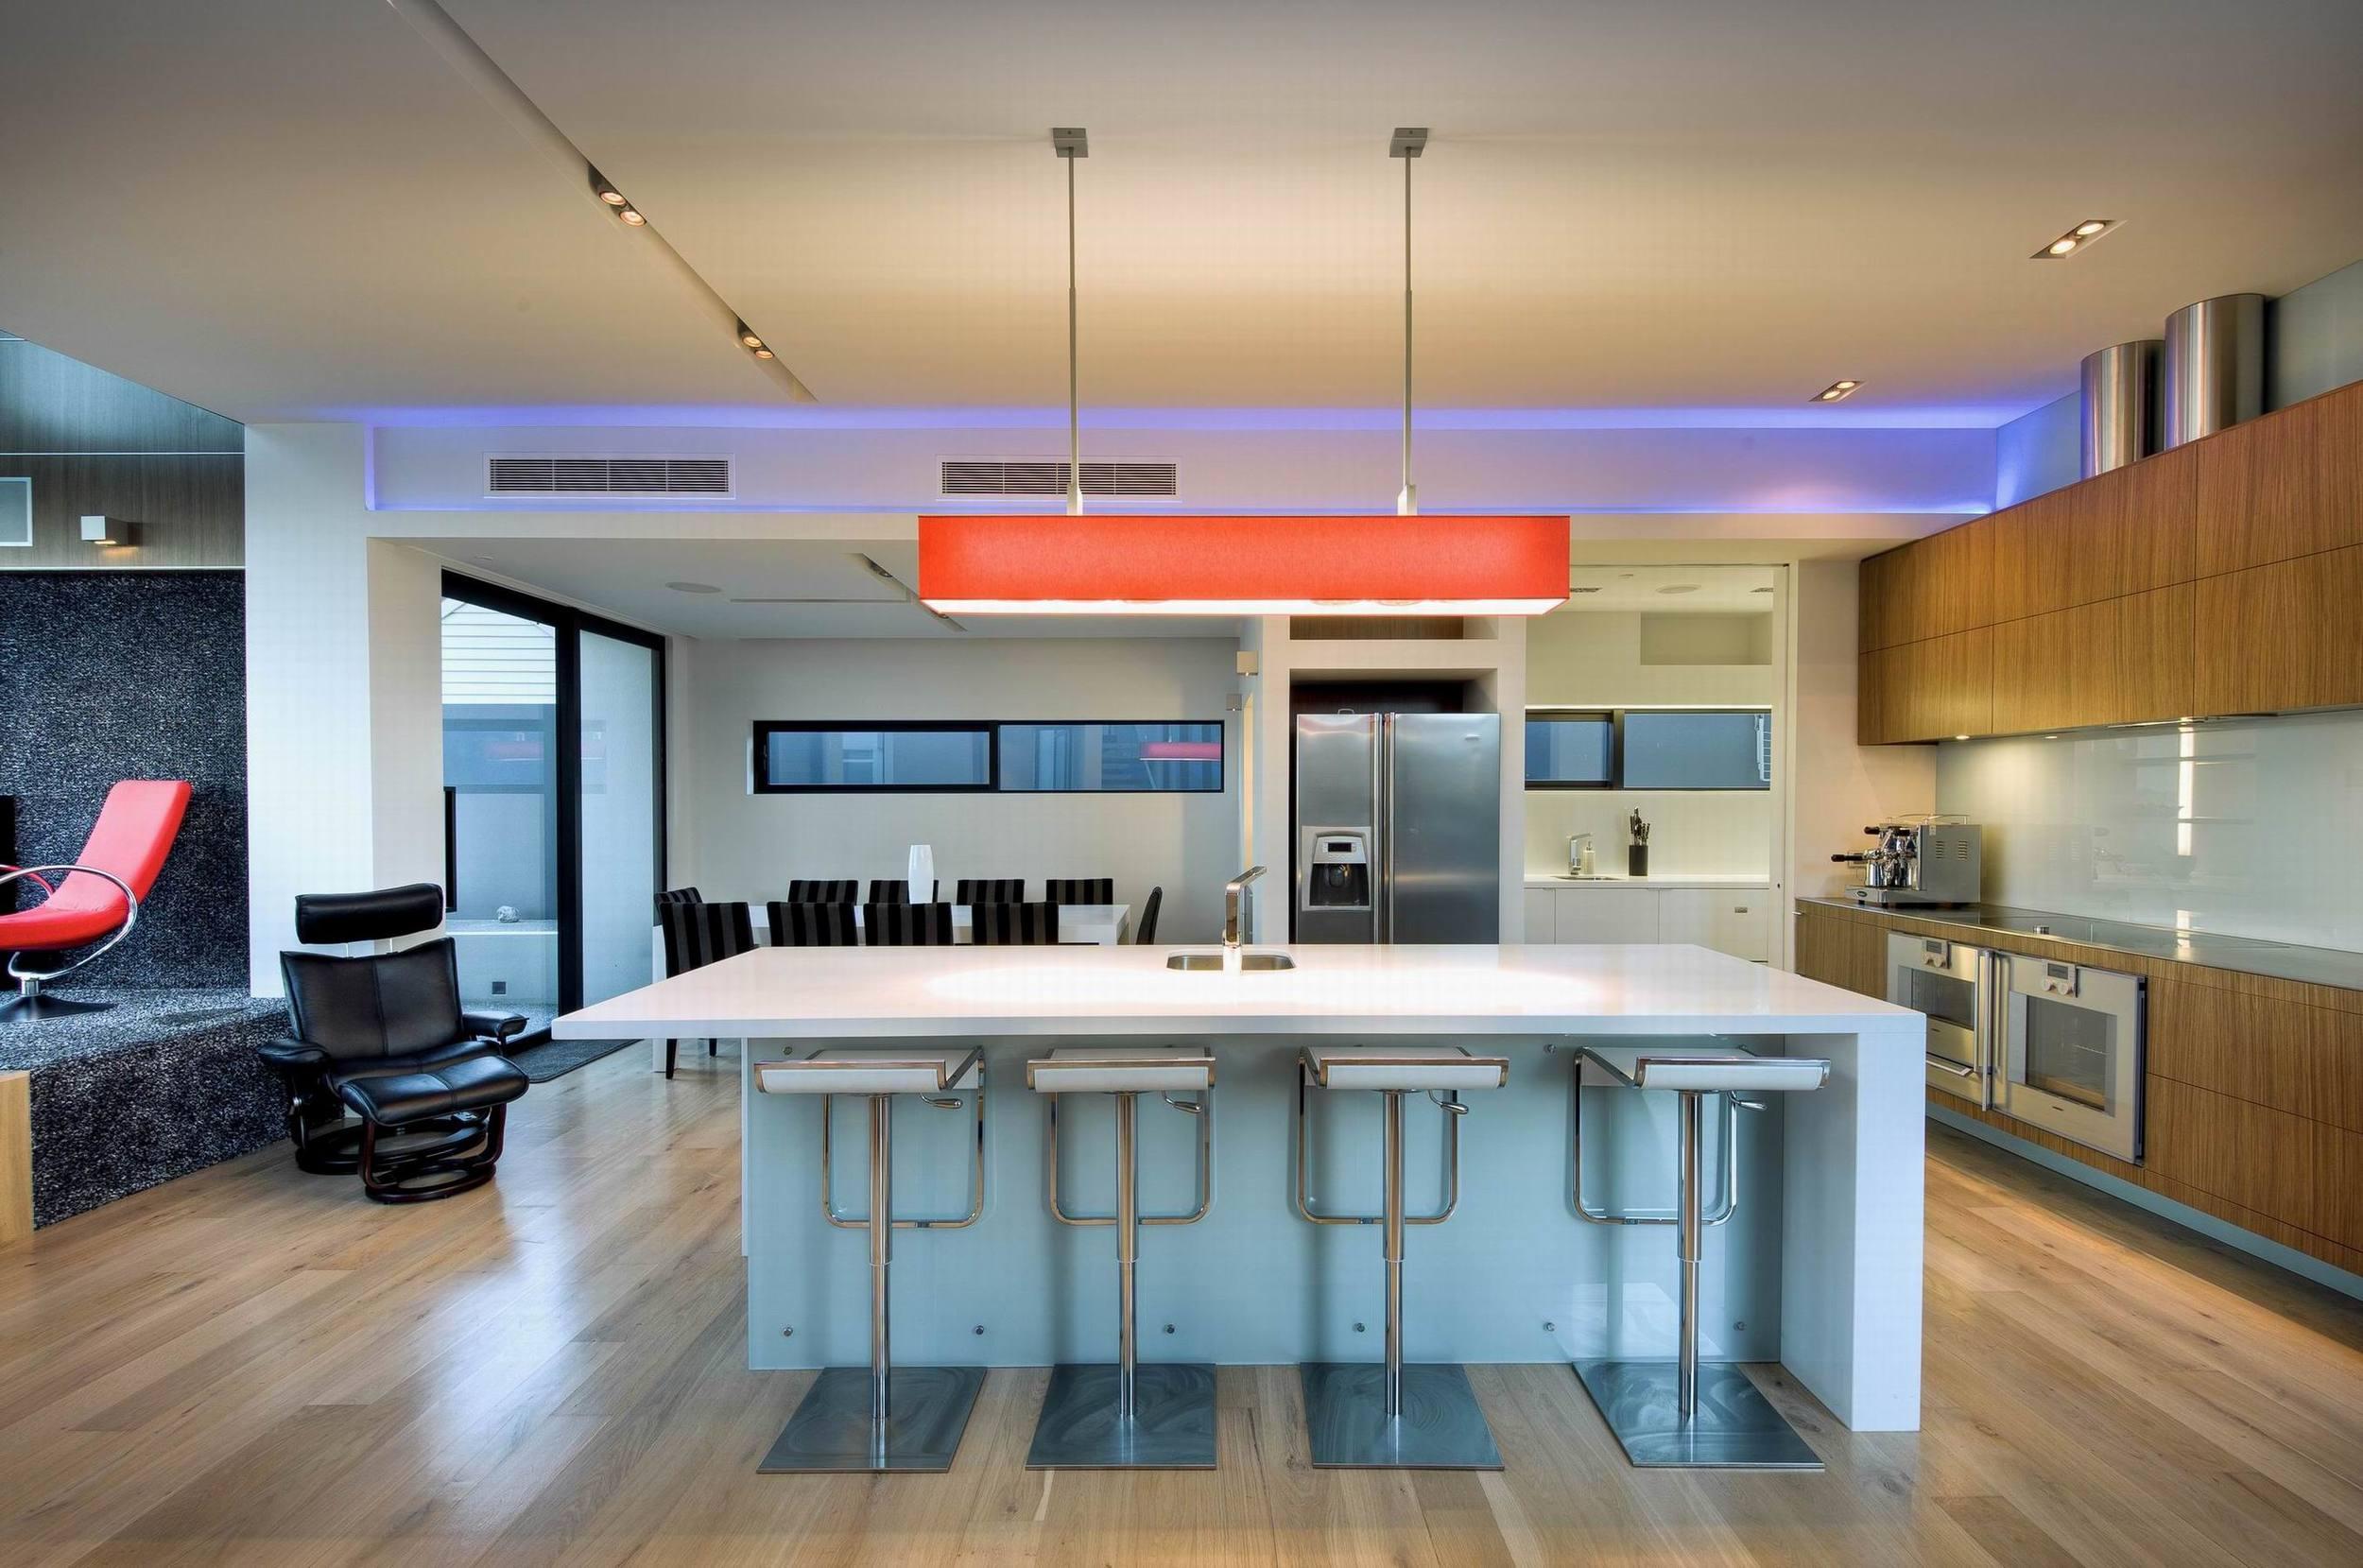 Vanaalst house_int kitchen_2 of 6.jpg